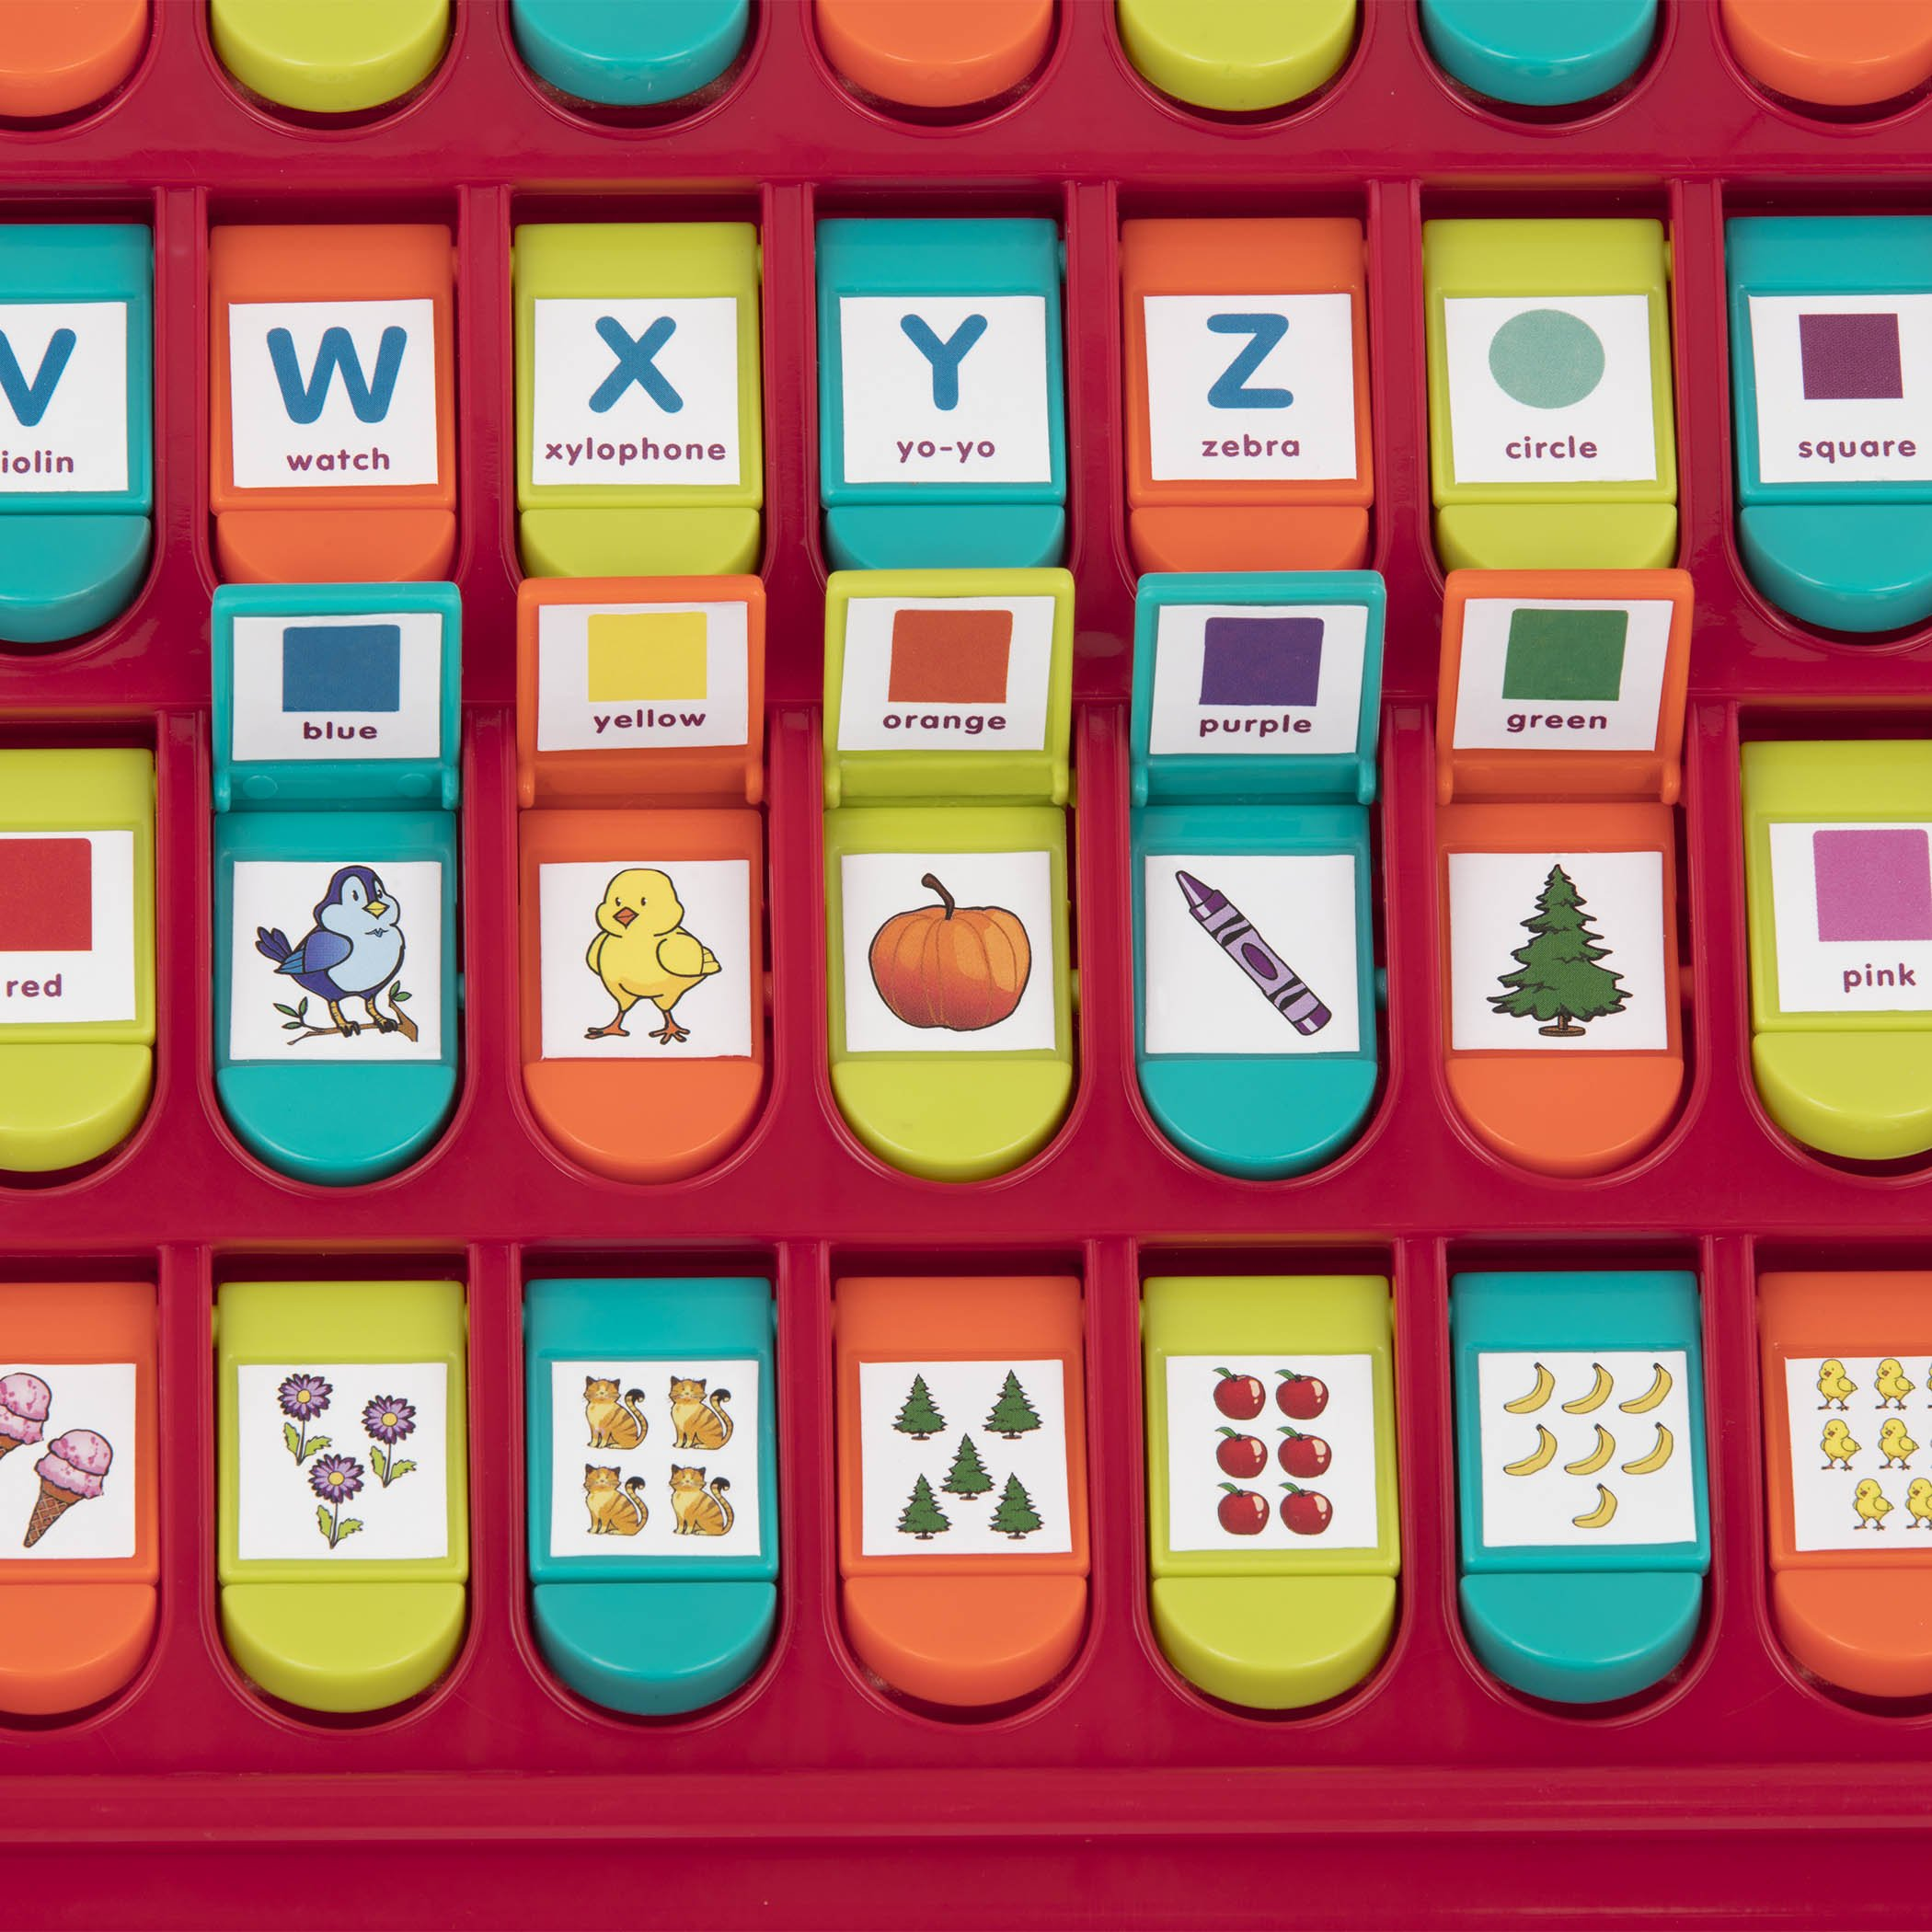 Details About Battat Hide And Seek Alphabet Preschool Learning Toy For Kids